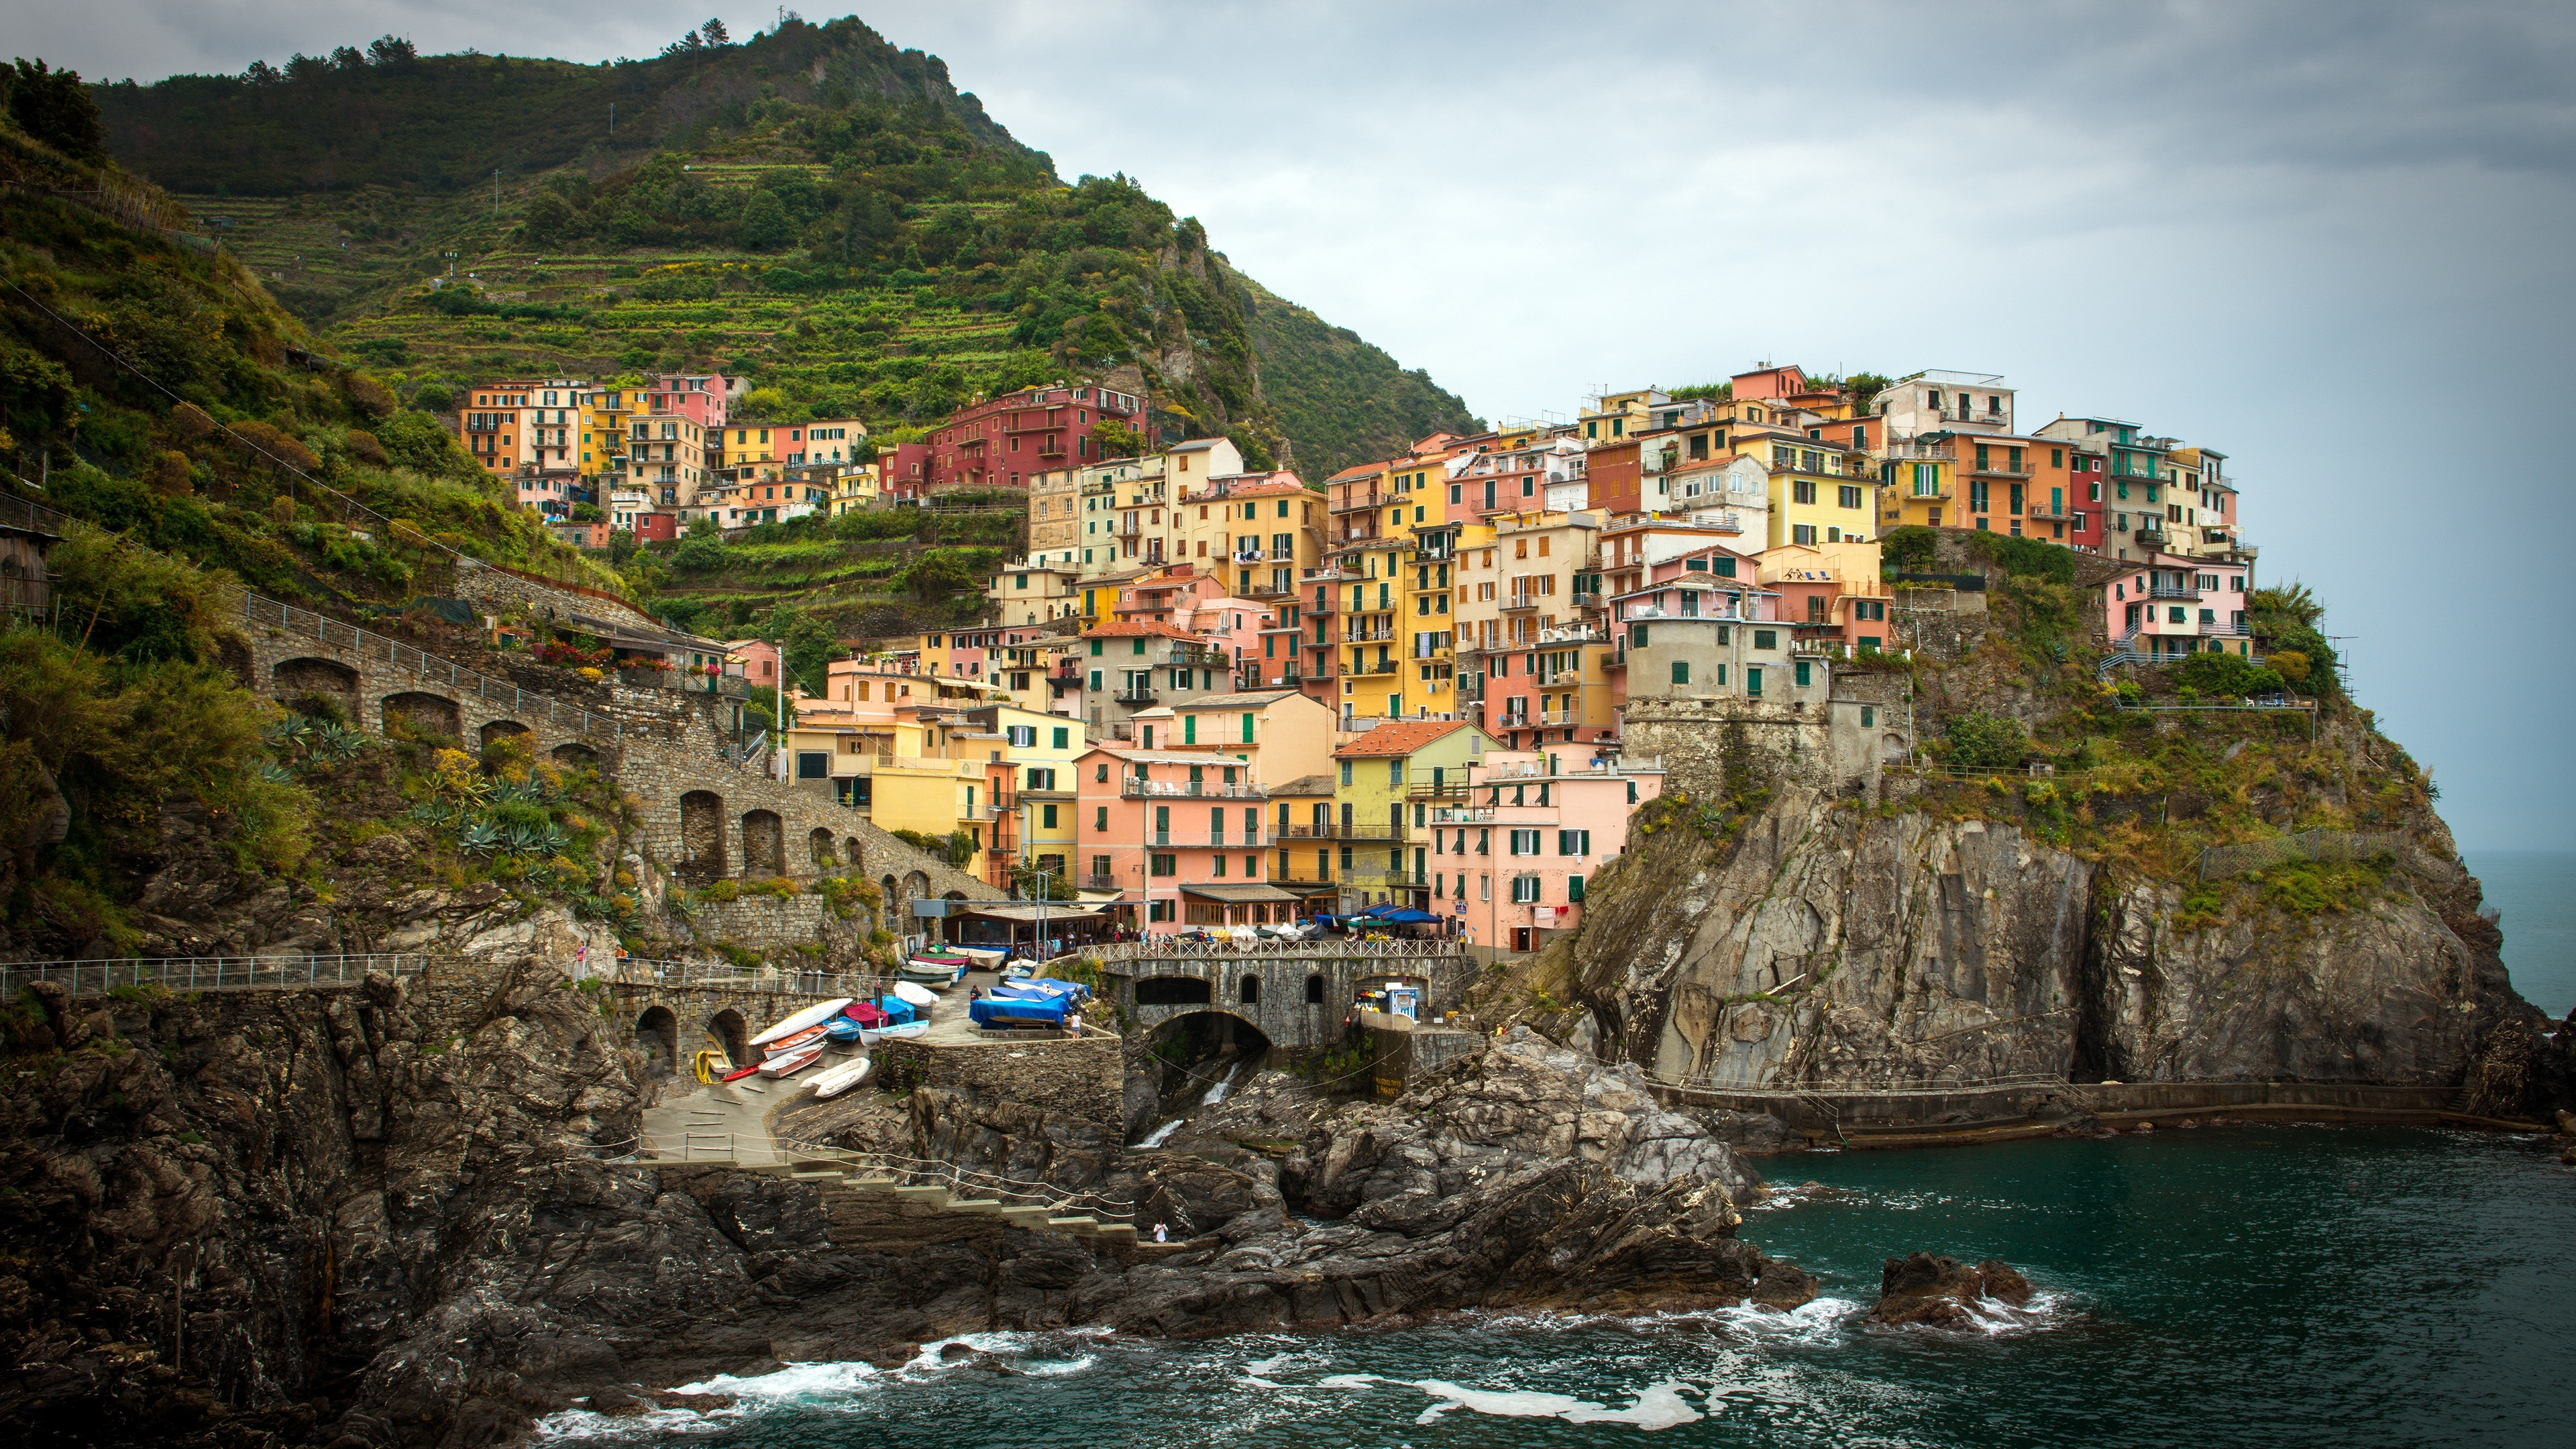 Cinque Terre Italy Villages 4K Desktop Wallpaper Uploaded by DesktopWalls